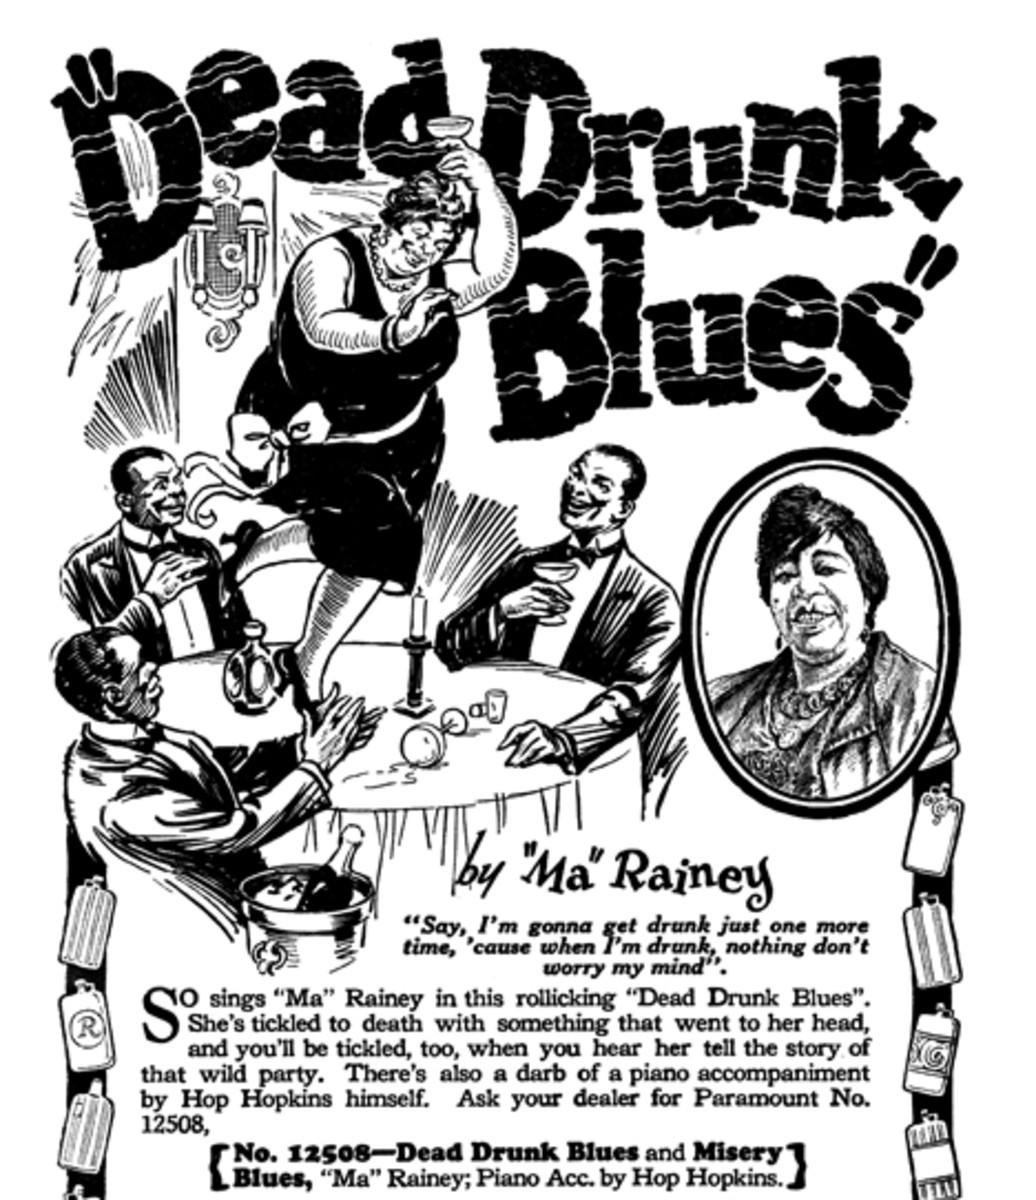 Gertrude 'Ma' Rainey Dead Drunk Blues advertisement